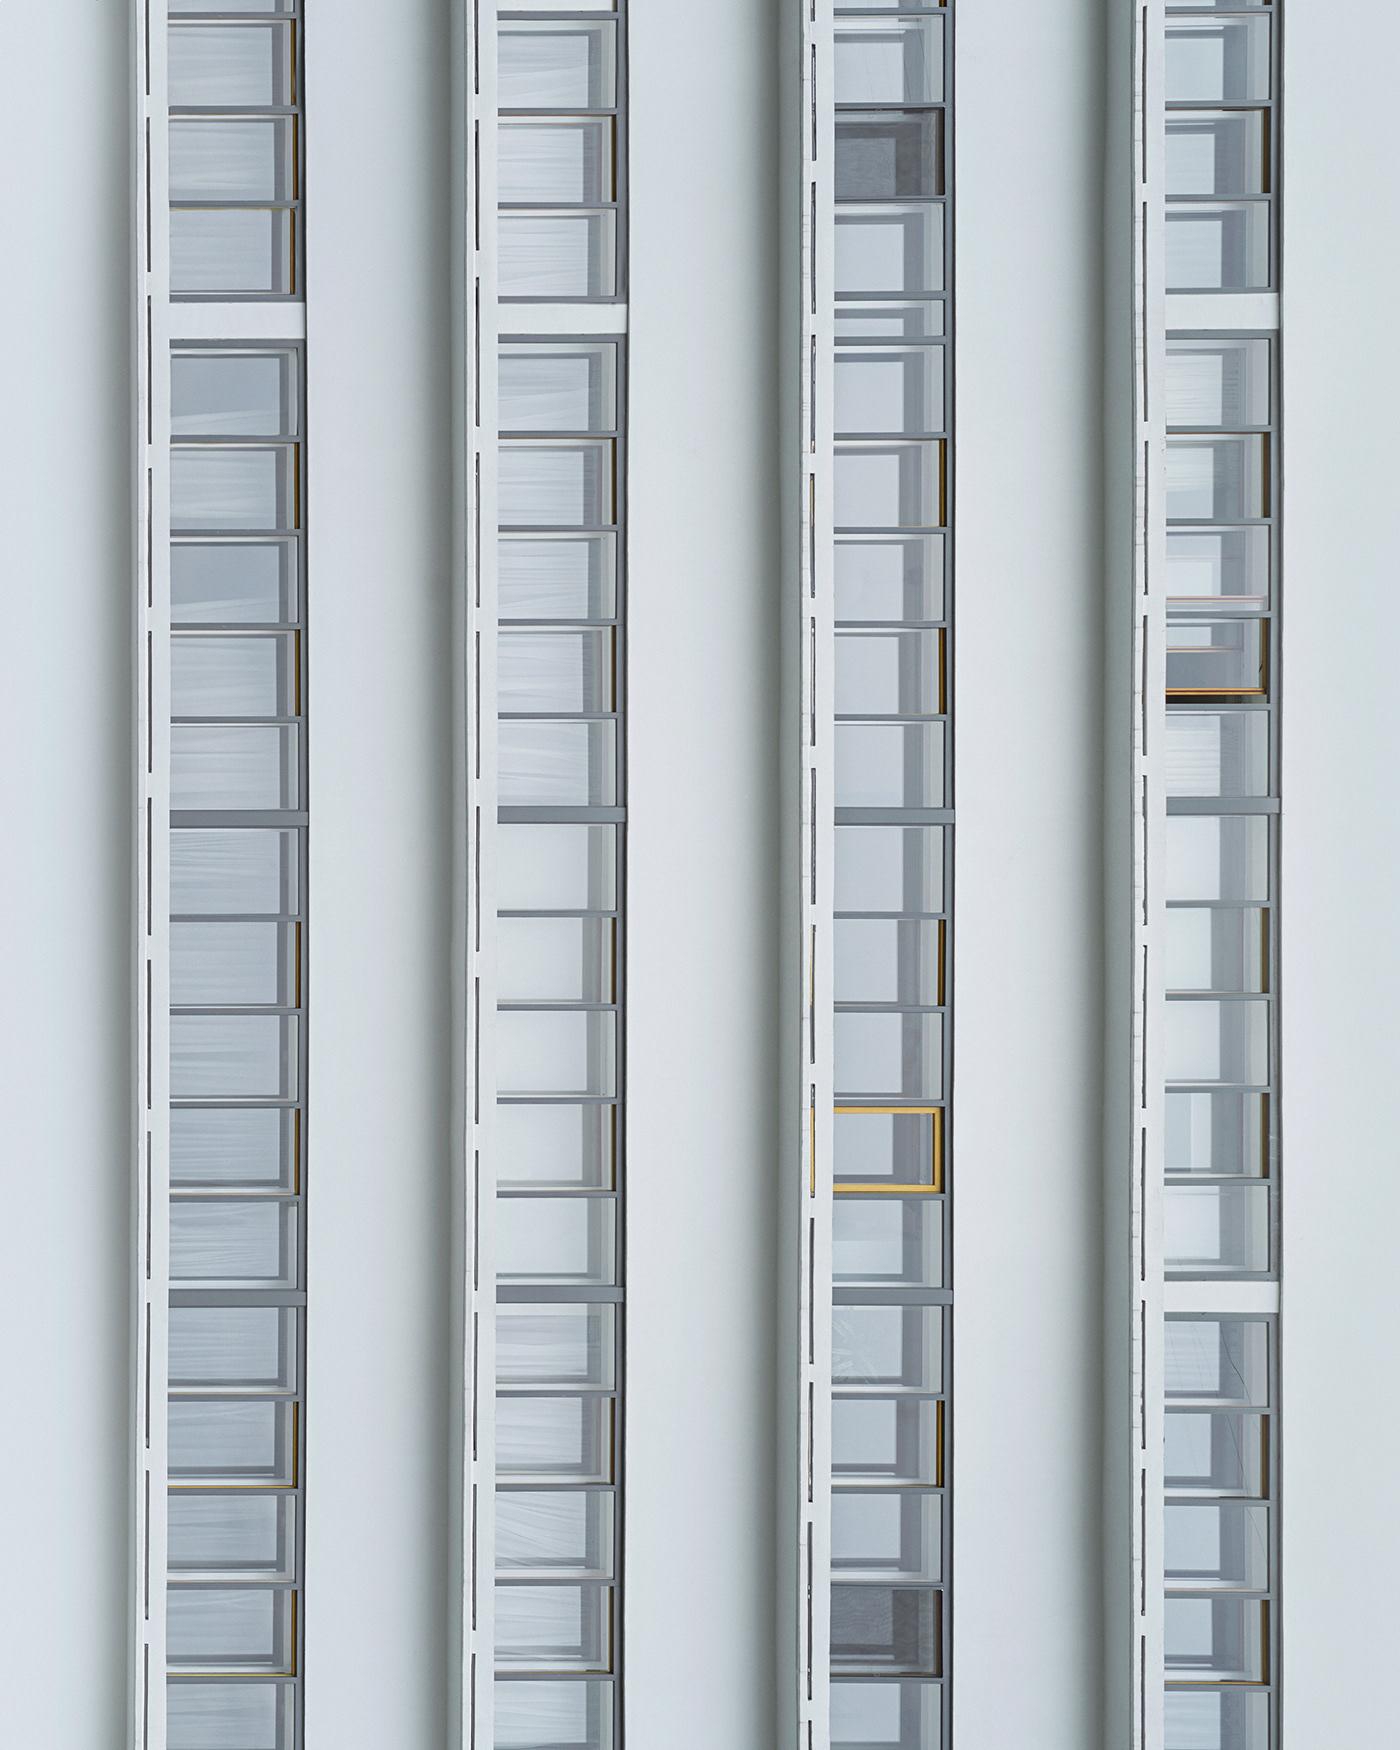 abode architecture building geometry Hasselblad Minimalism Phoroshop rhythm Russia